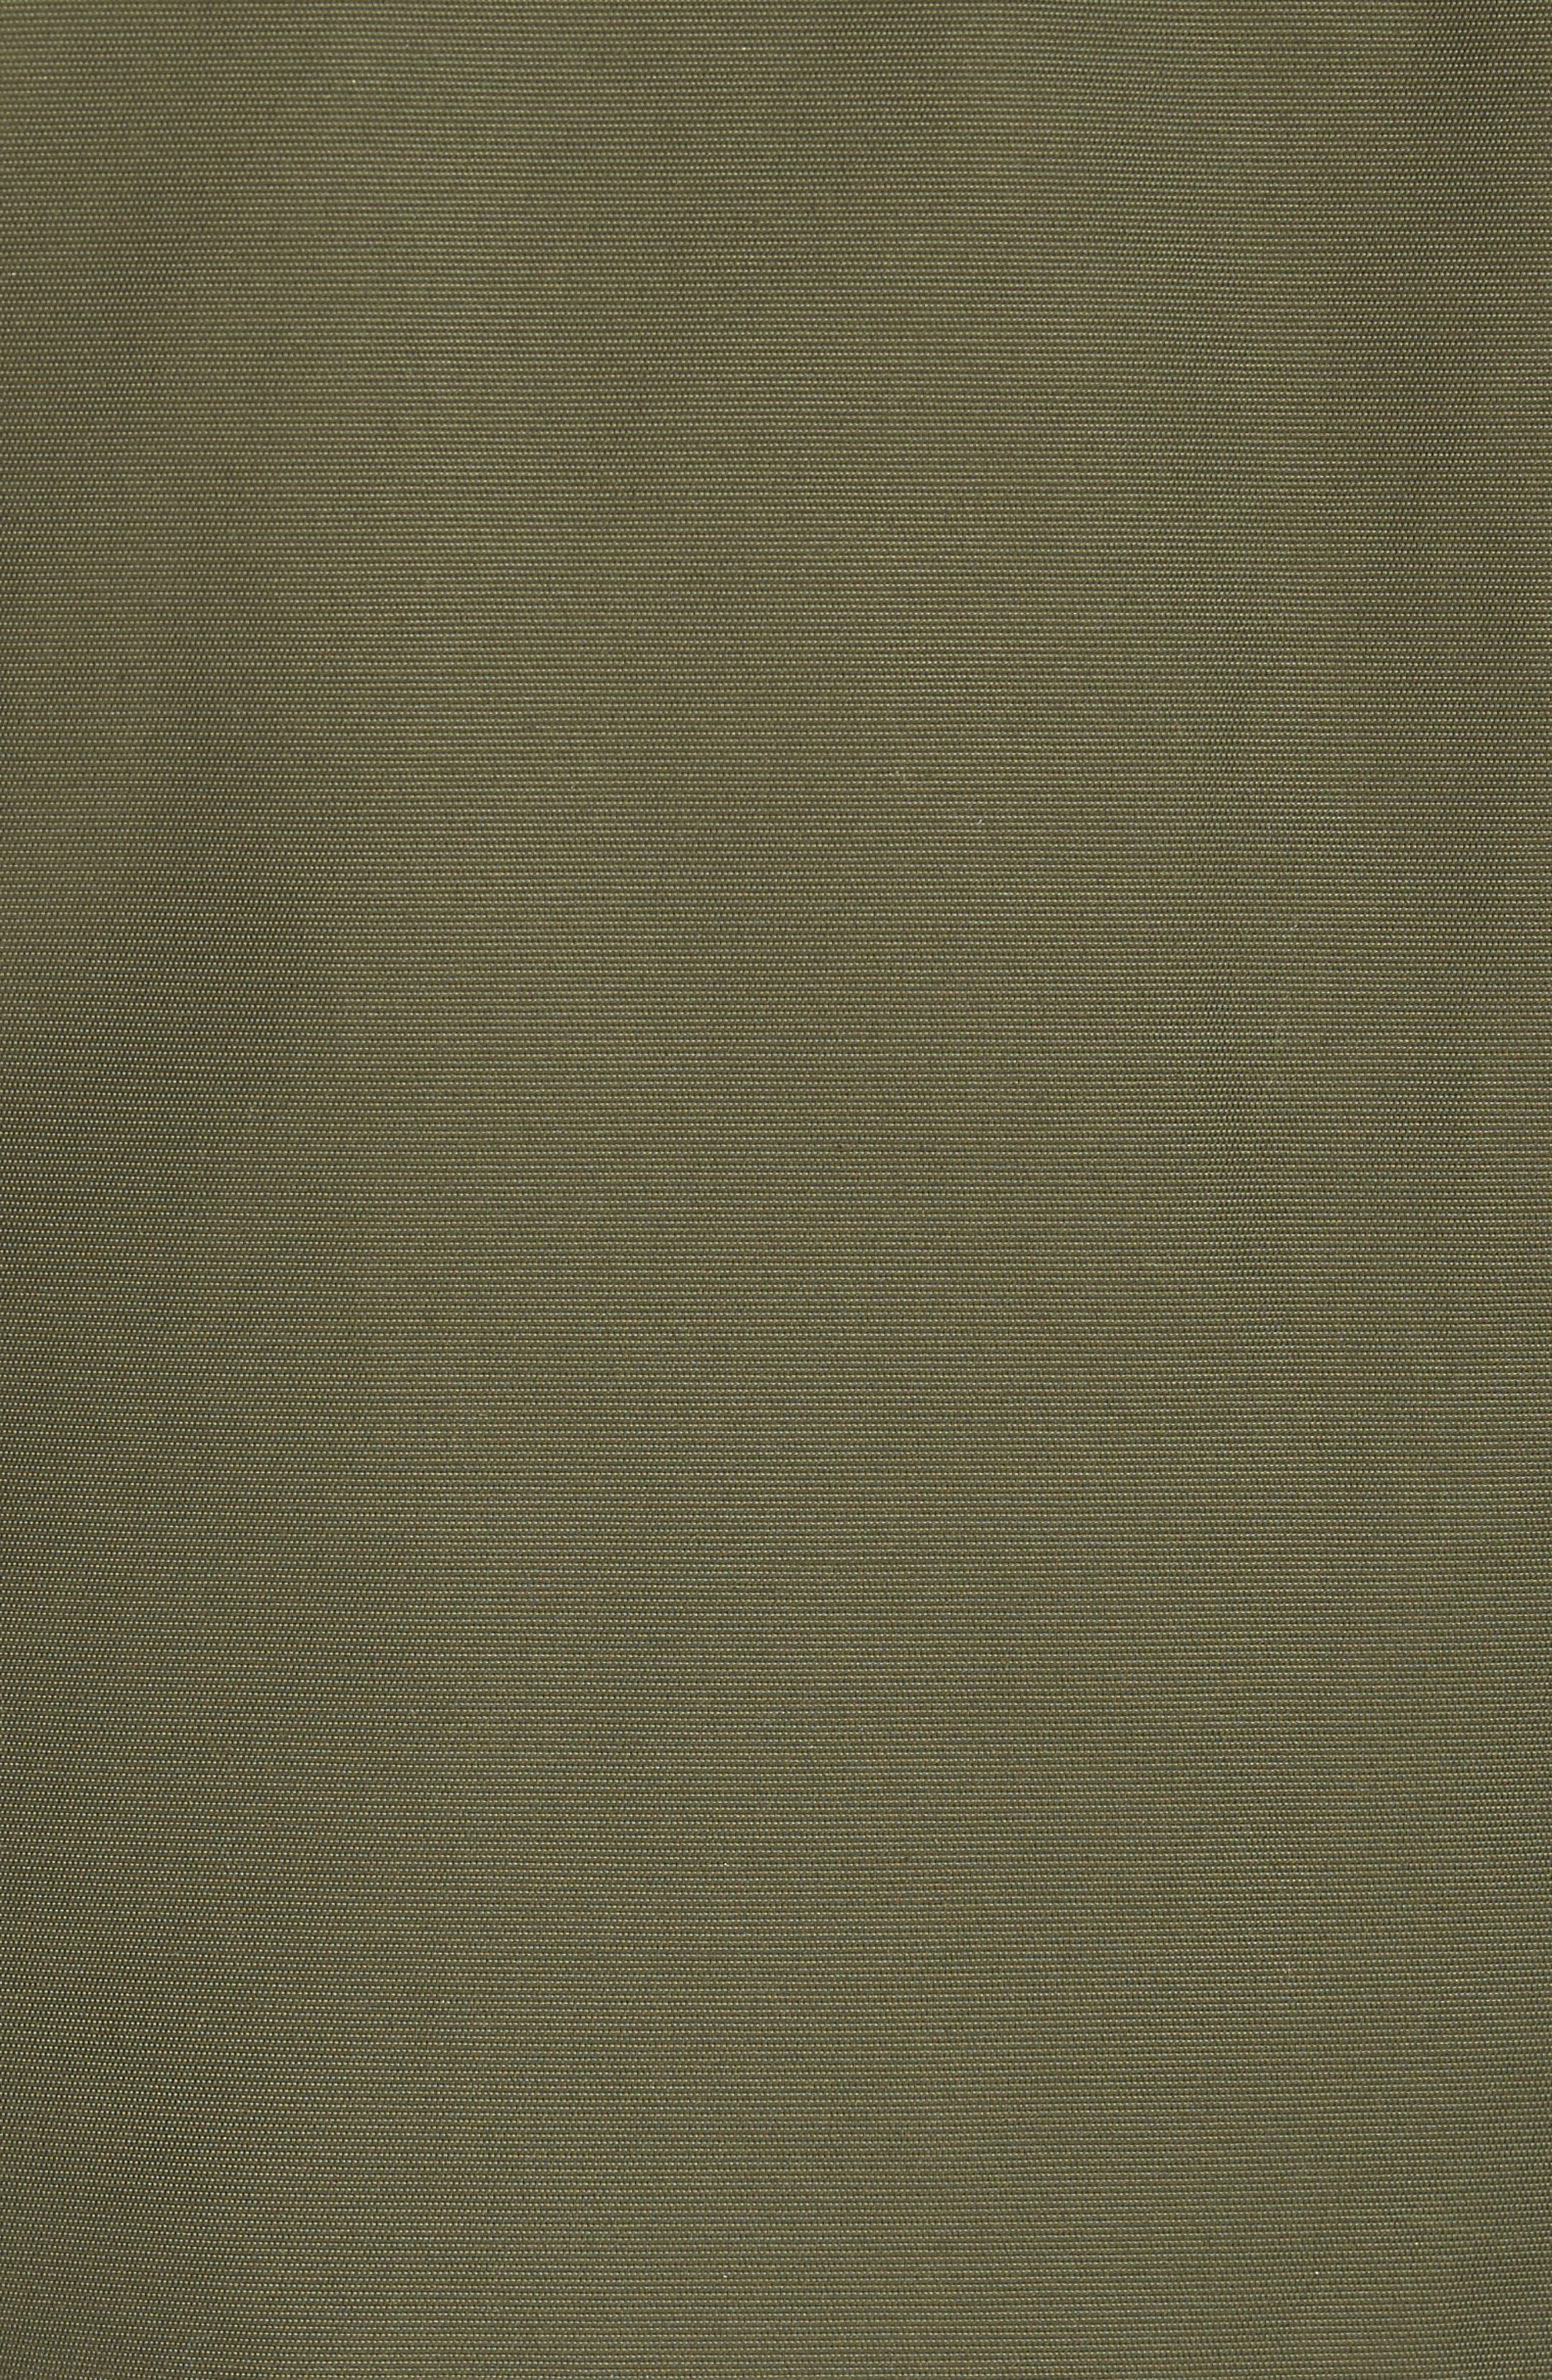 Down Coat with Genuine Fox Fur Trim,                             Alternate thumbnail 6, color,                             300